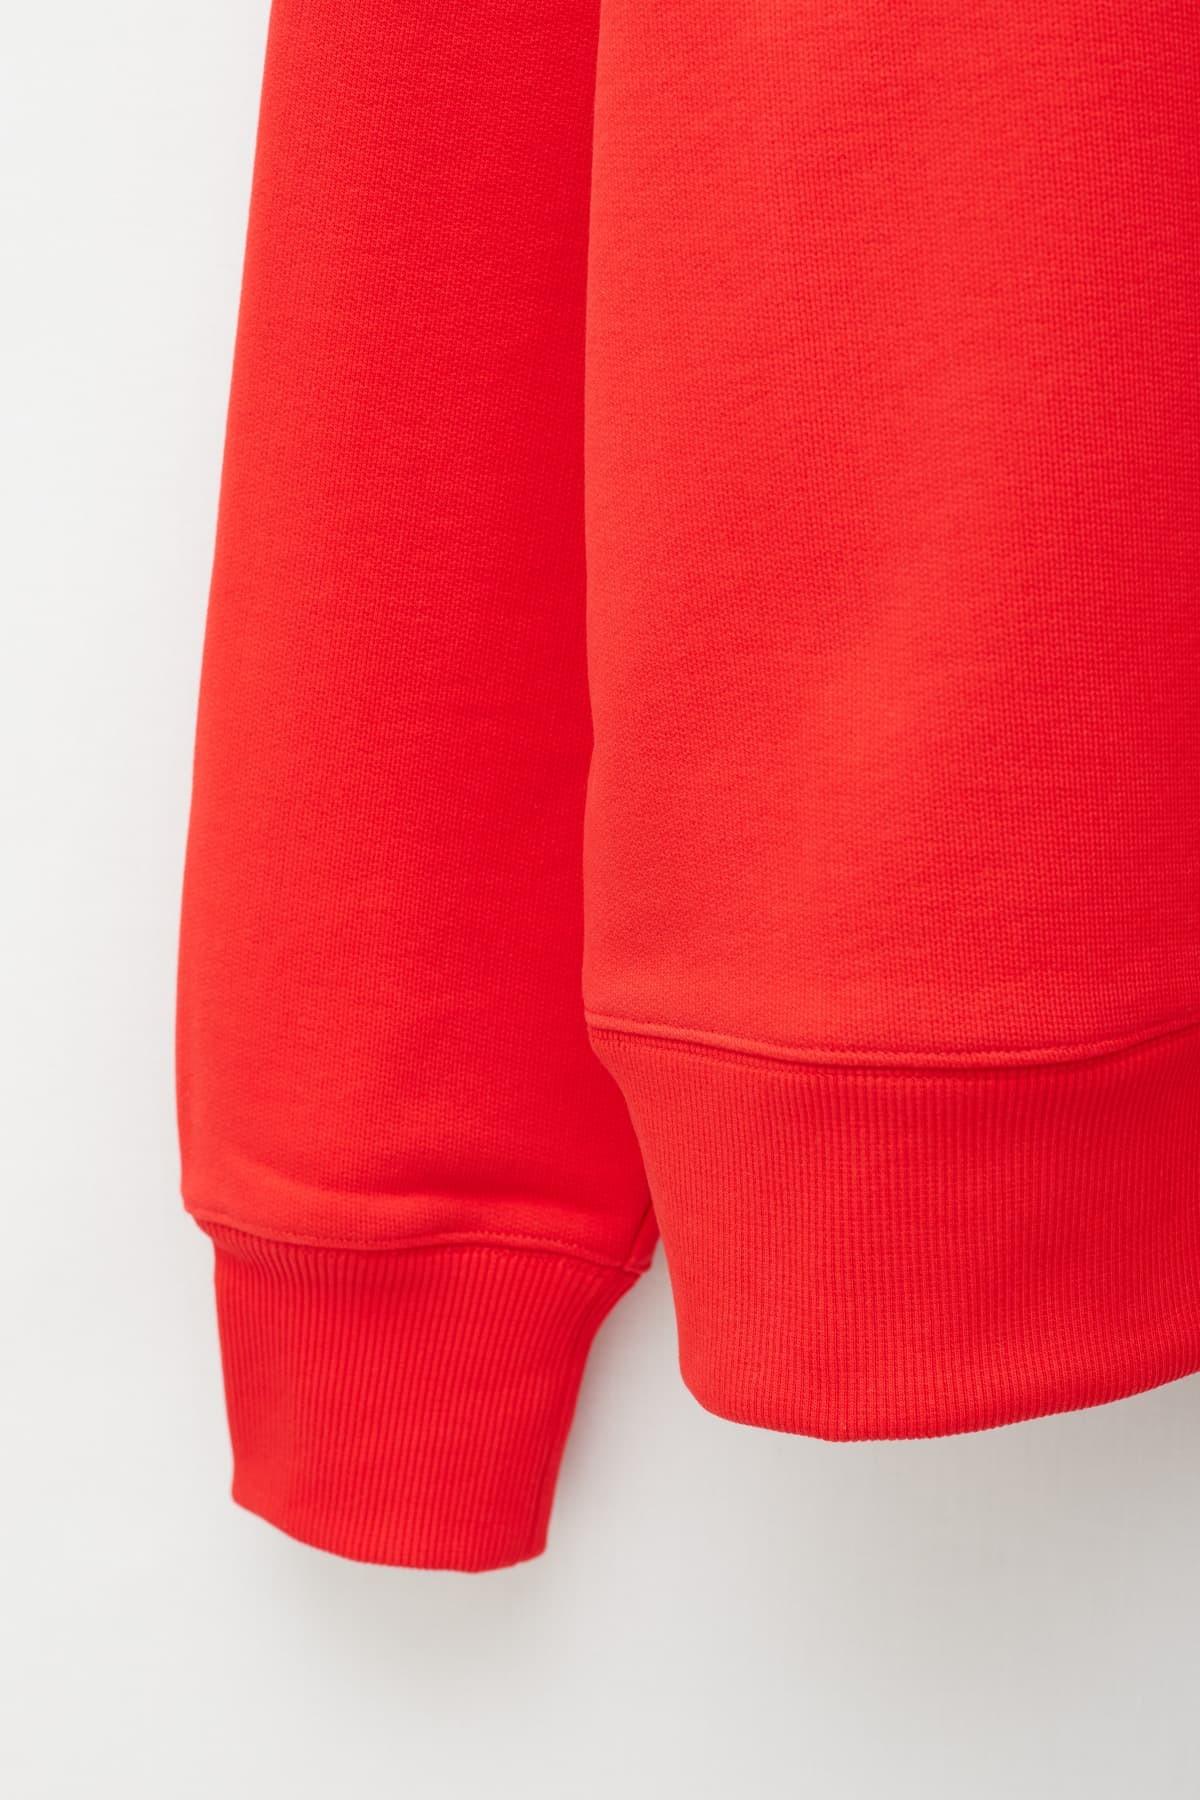 Comprar Carhartt Wip Black Asher LS Shirt